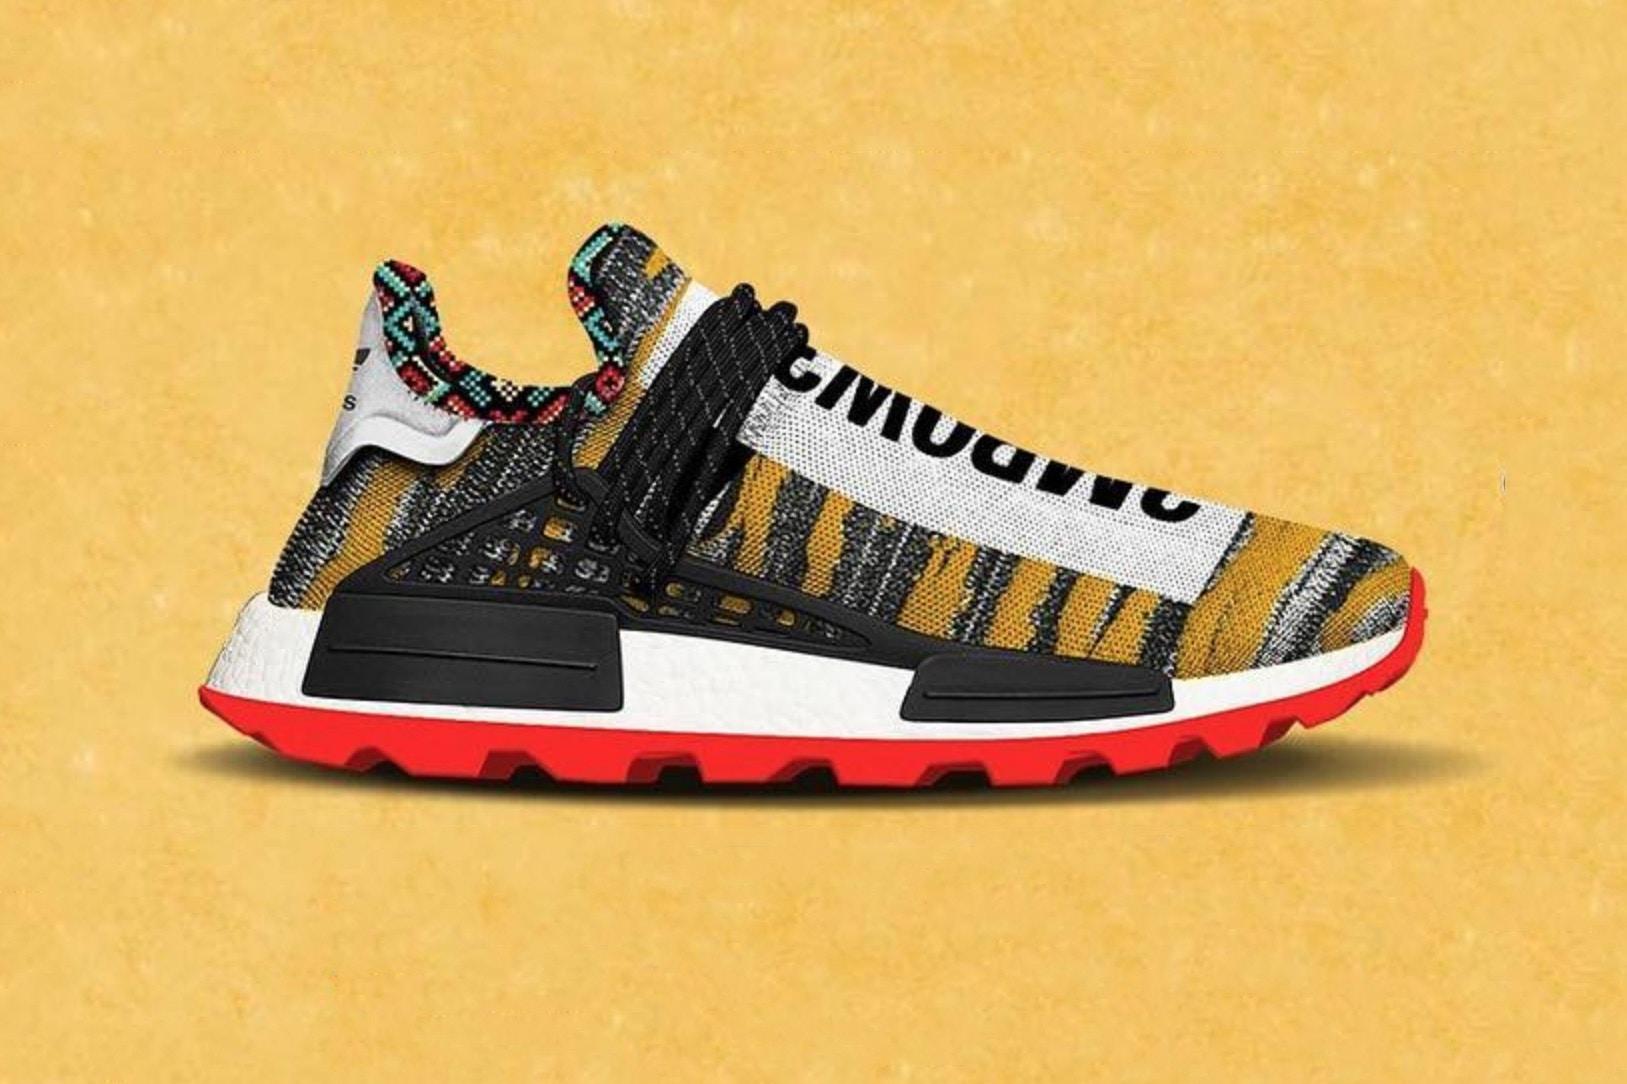 adidas-pharrell-afro-hu-nmd-01